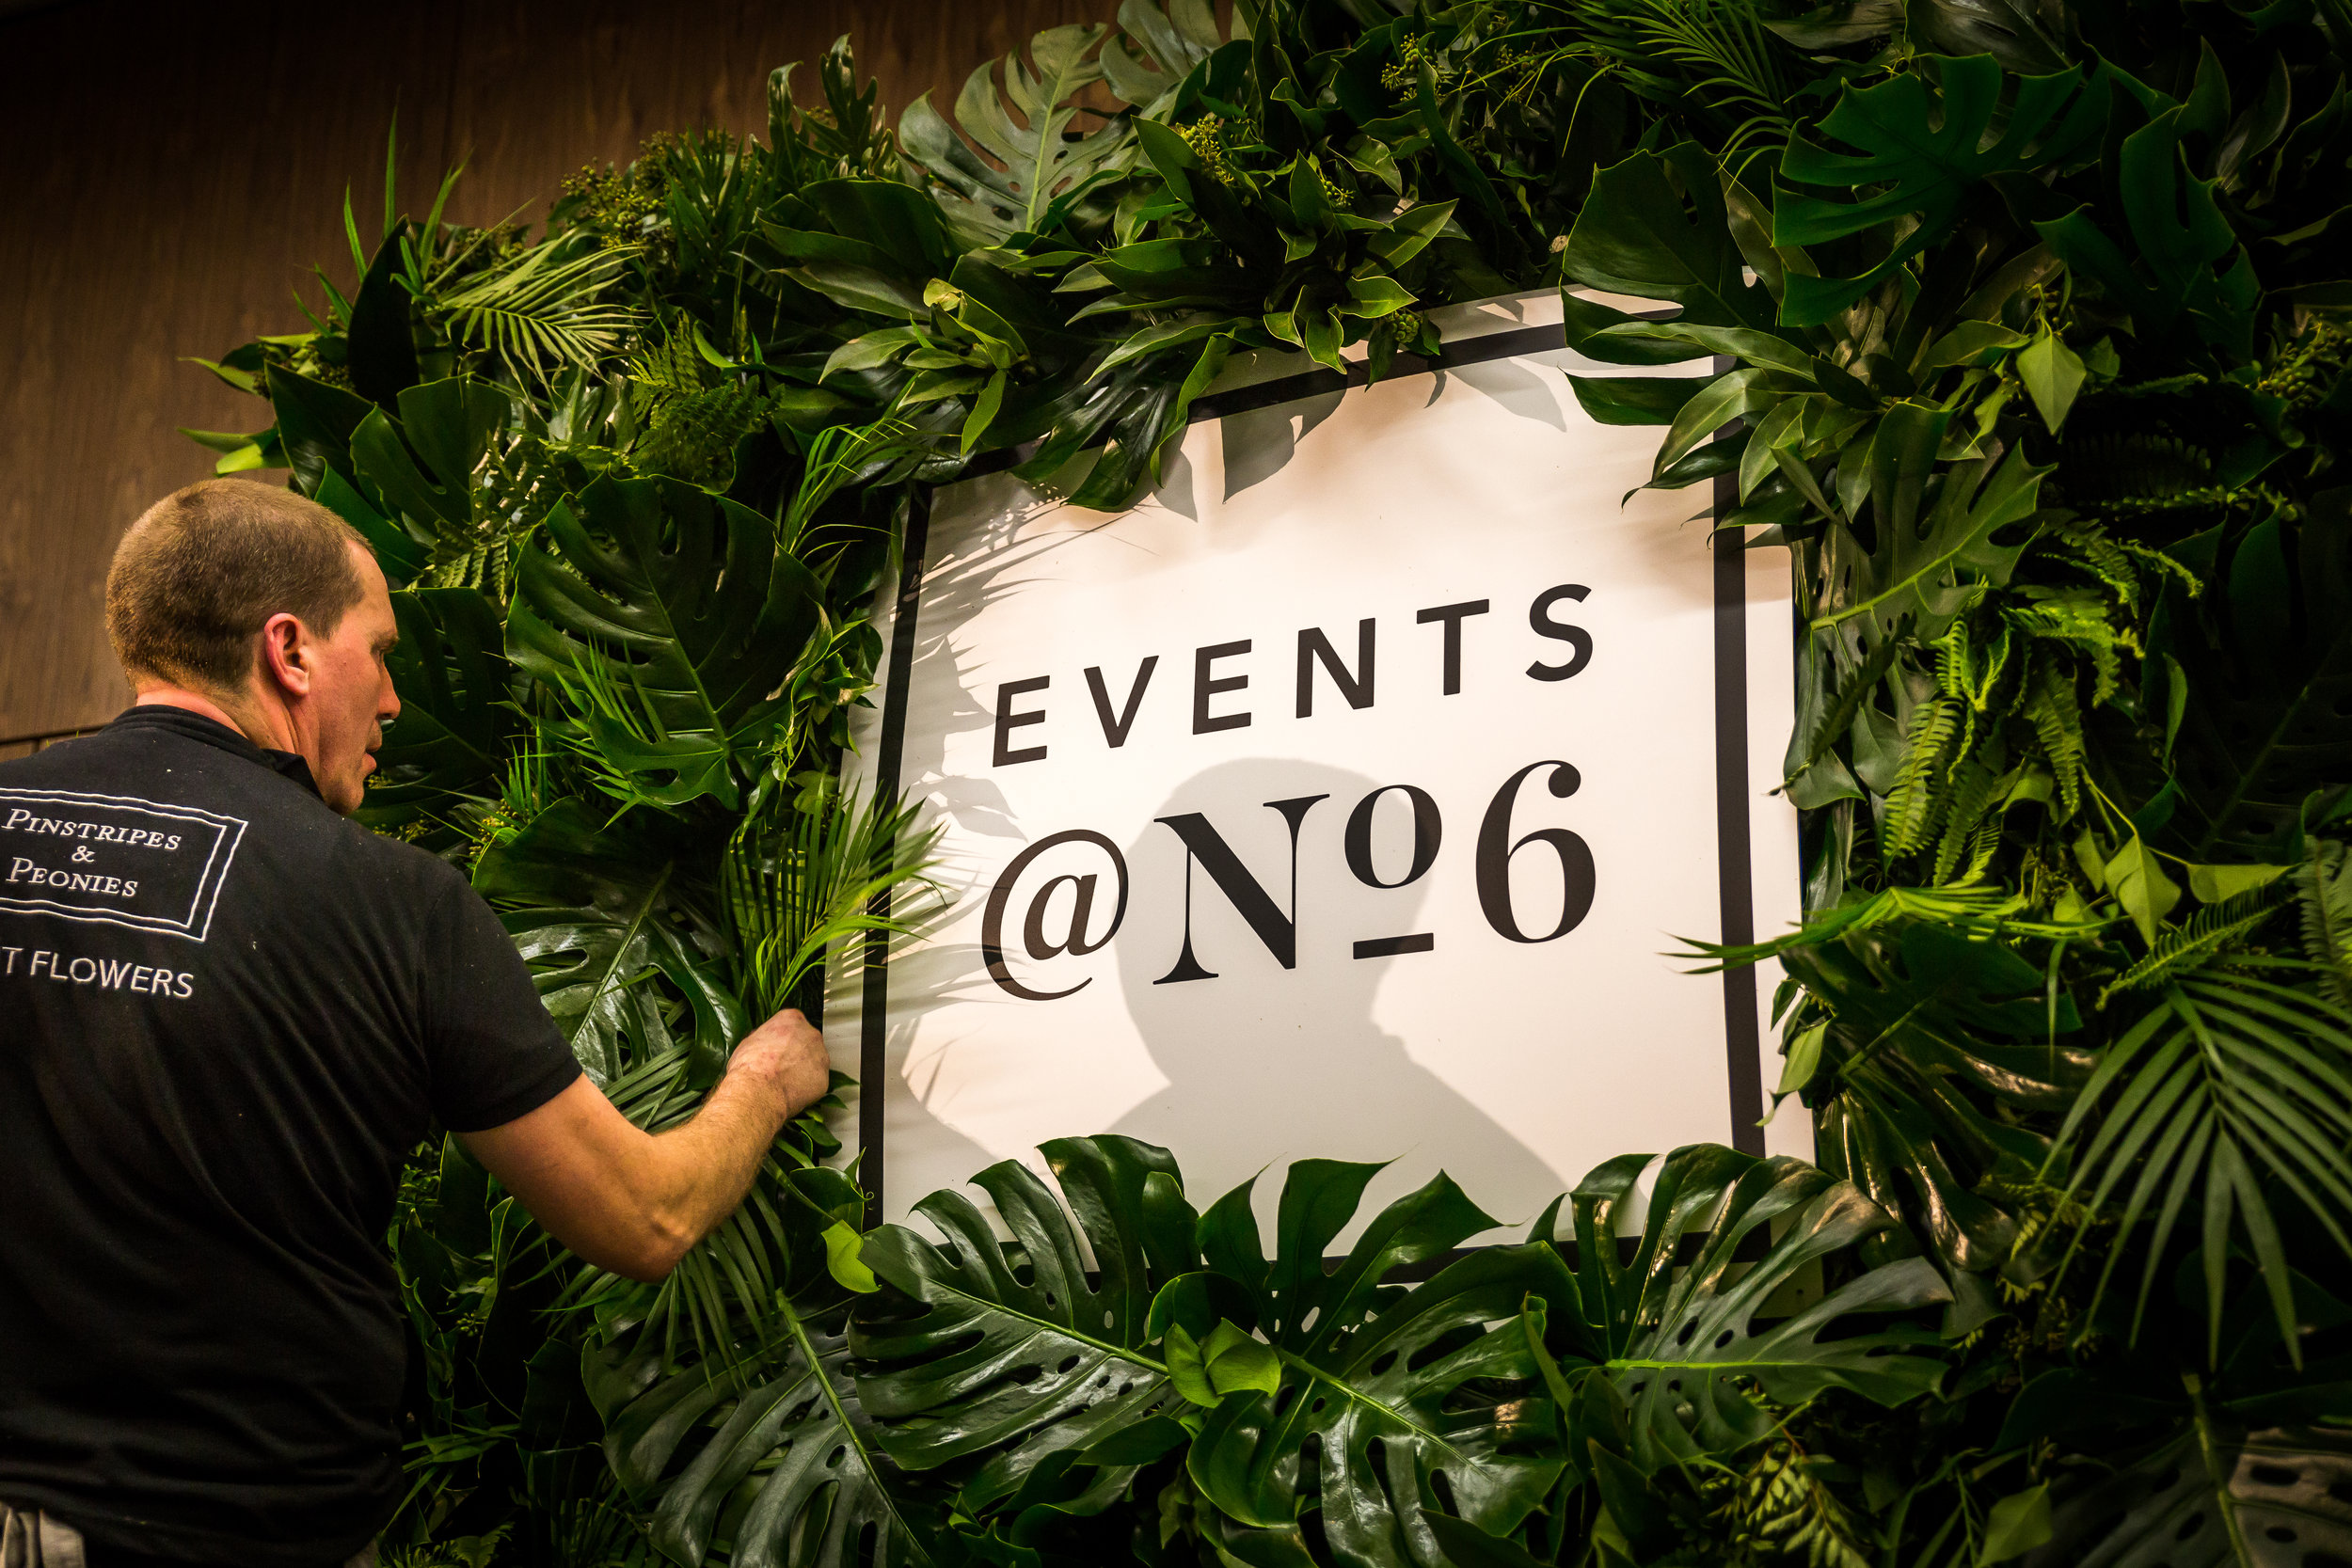 Eventsatn6-4.jpg